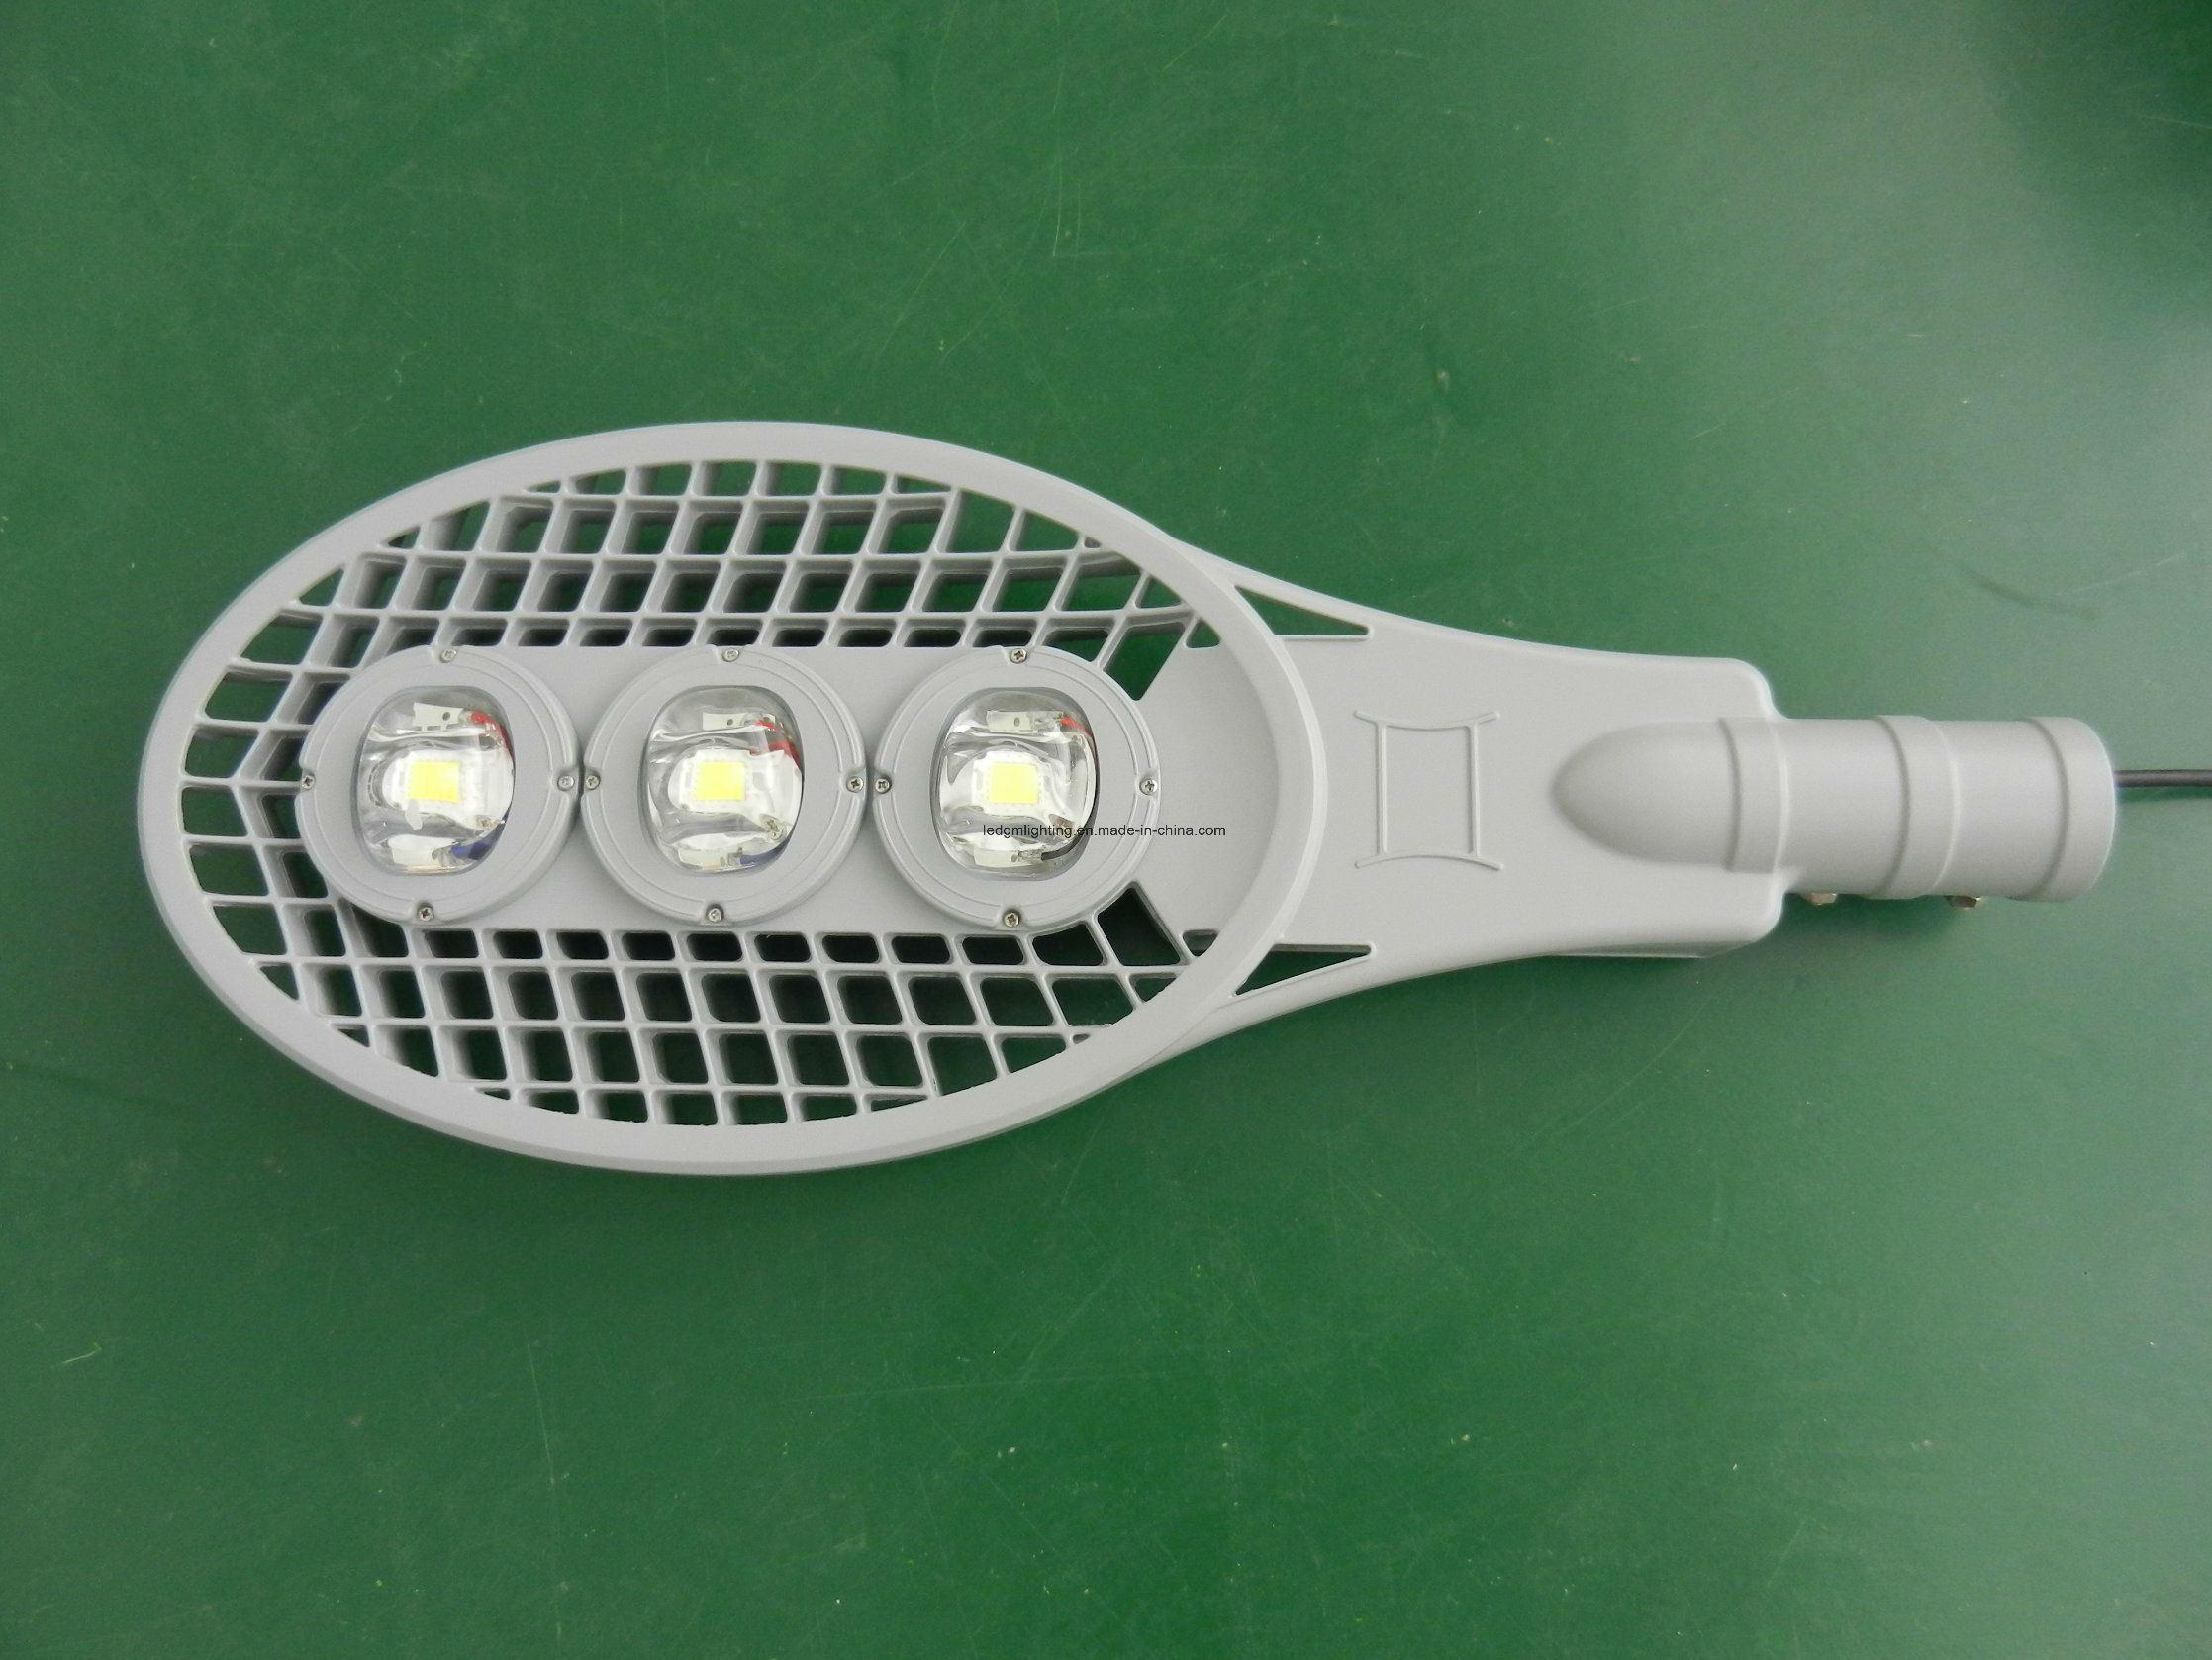 Bridgelux Chip Meanwell Driver 150W High Power LED Street Light